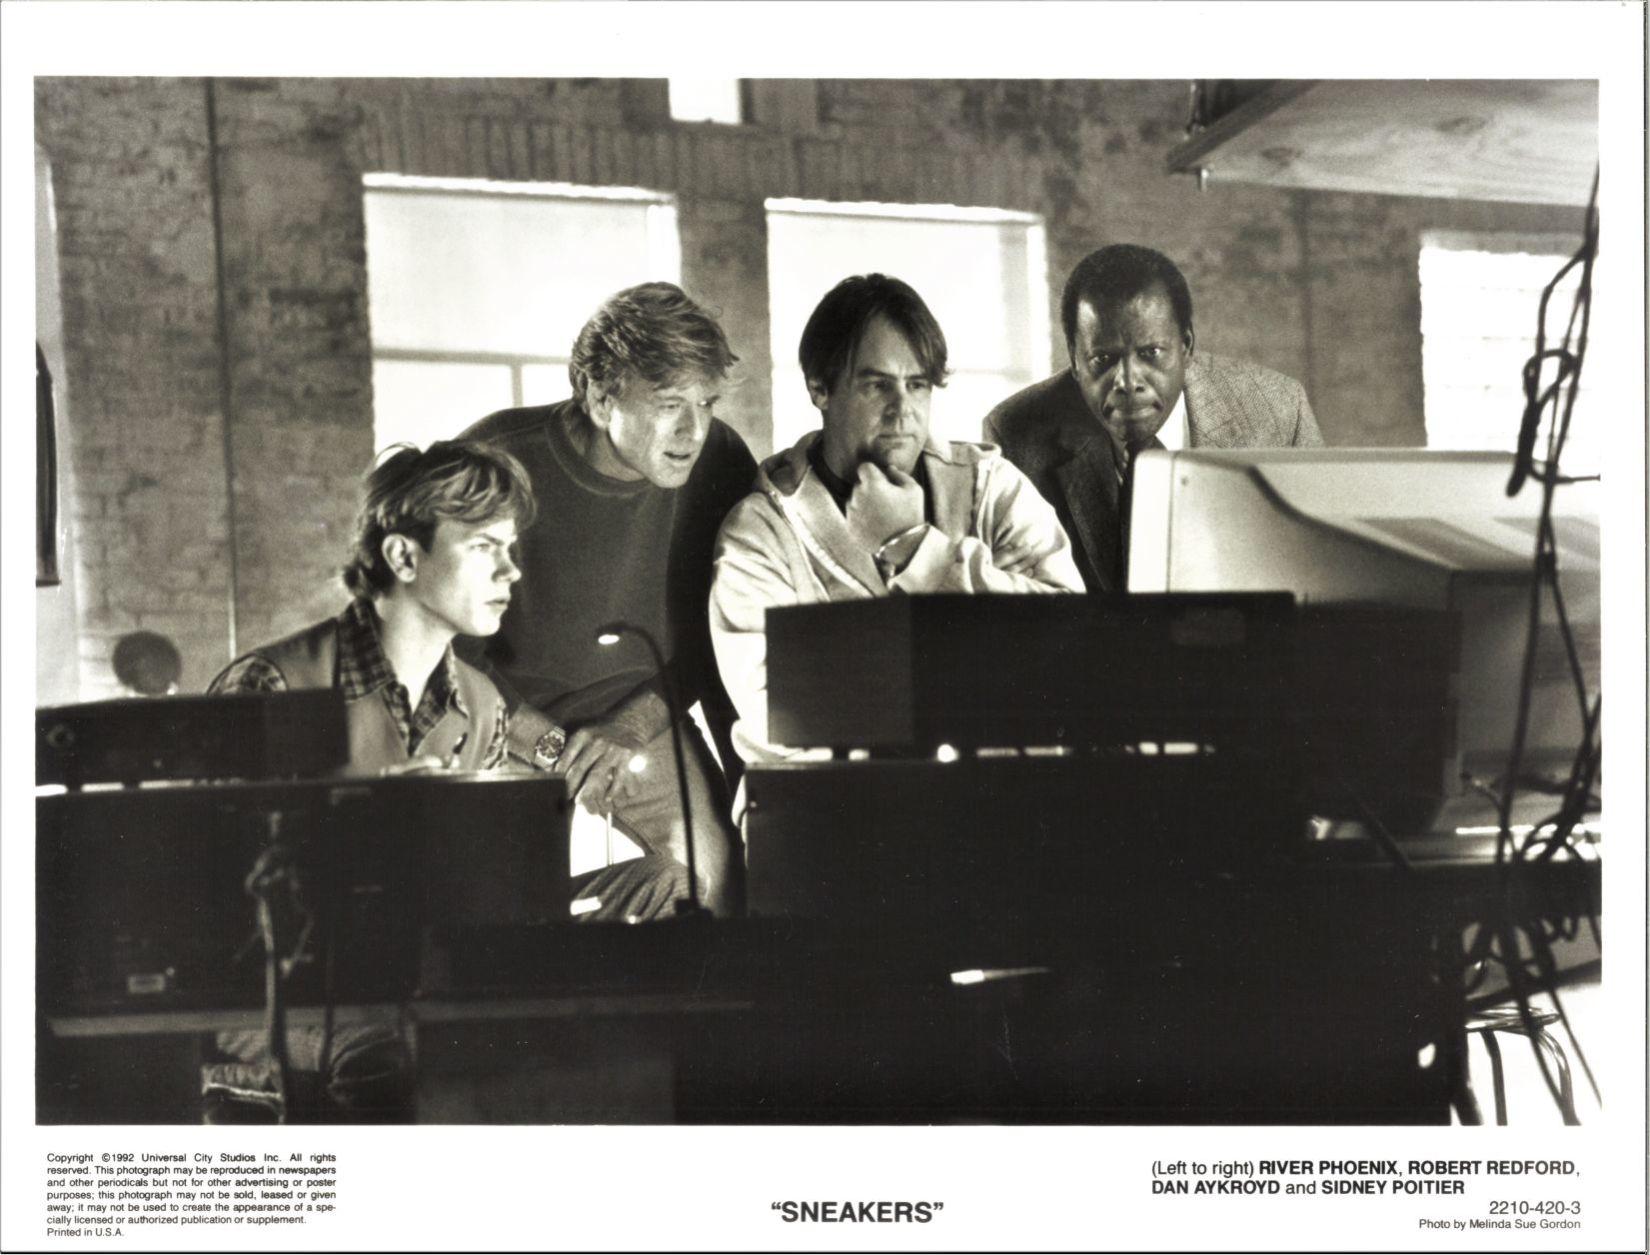 Packard Campus stars in 1992 film